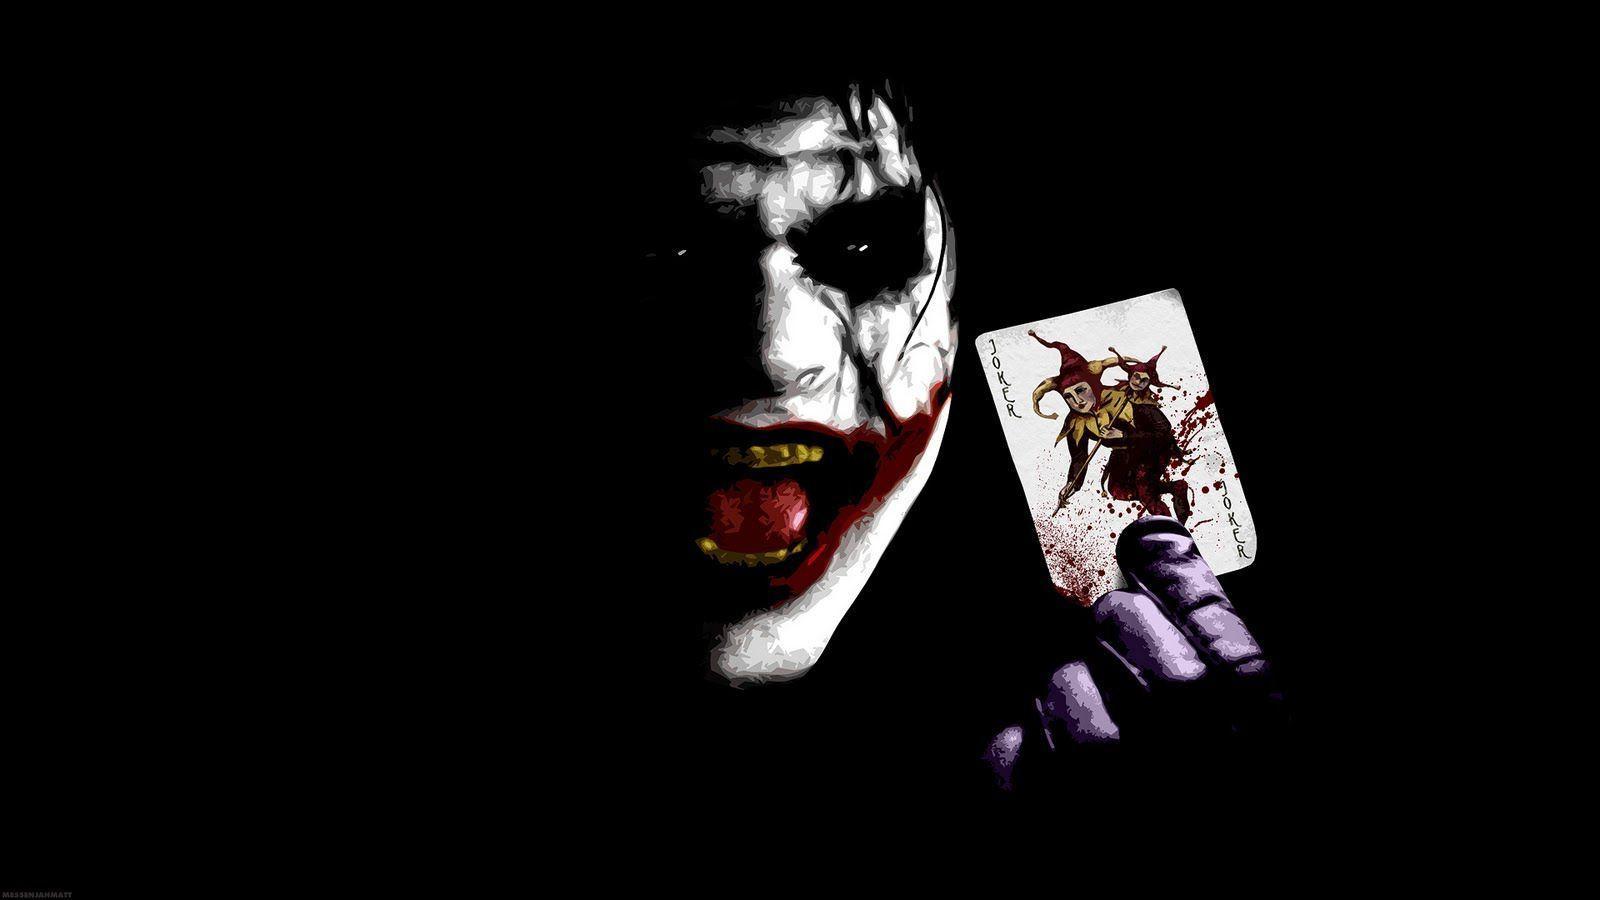 Comic <b>Joker Wallpaper</b>